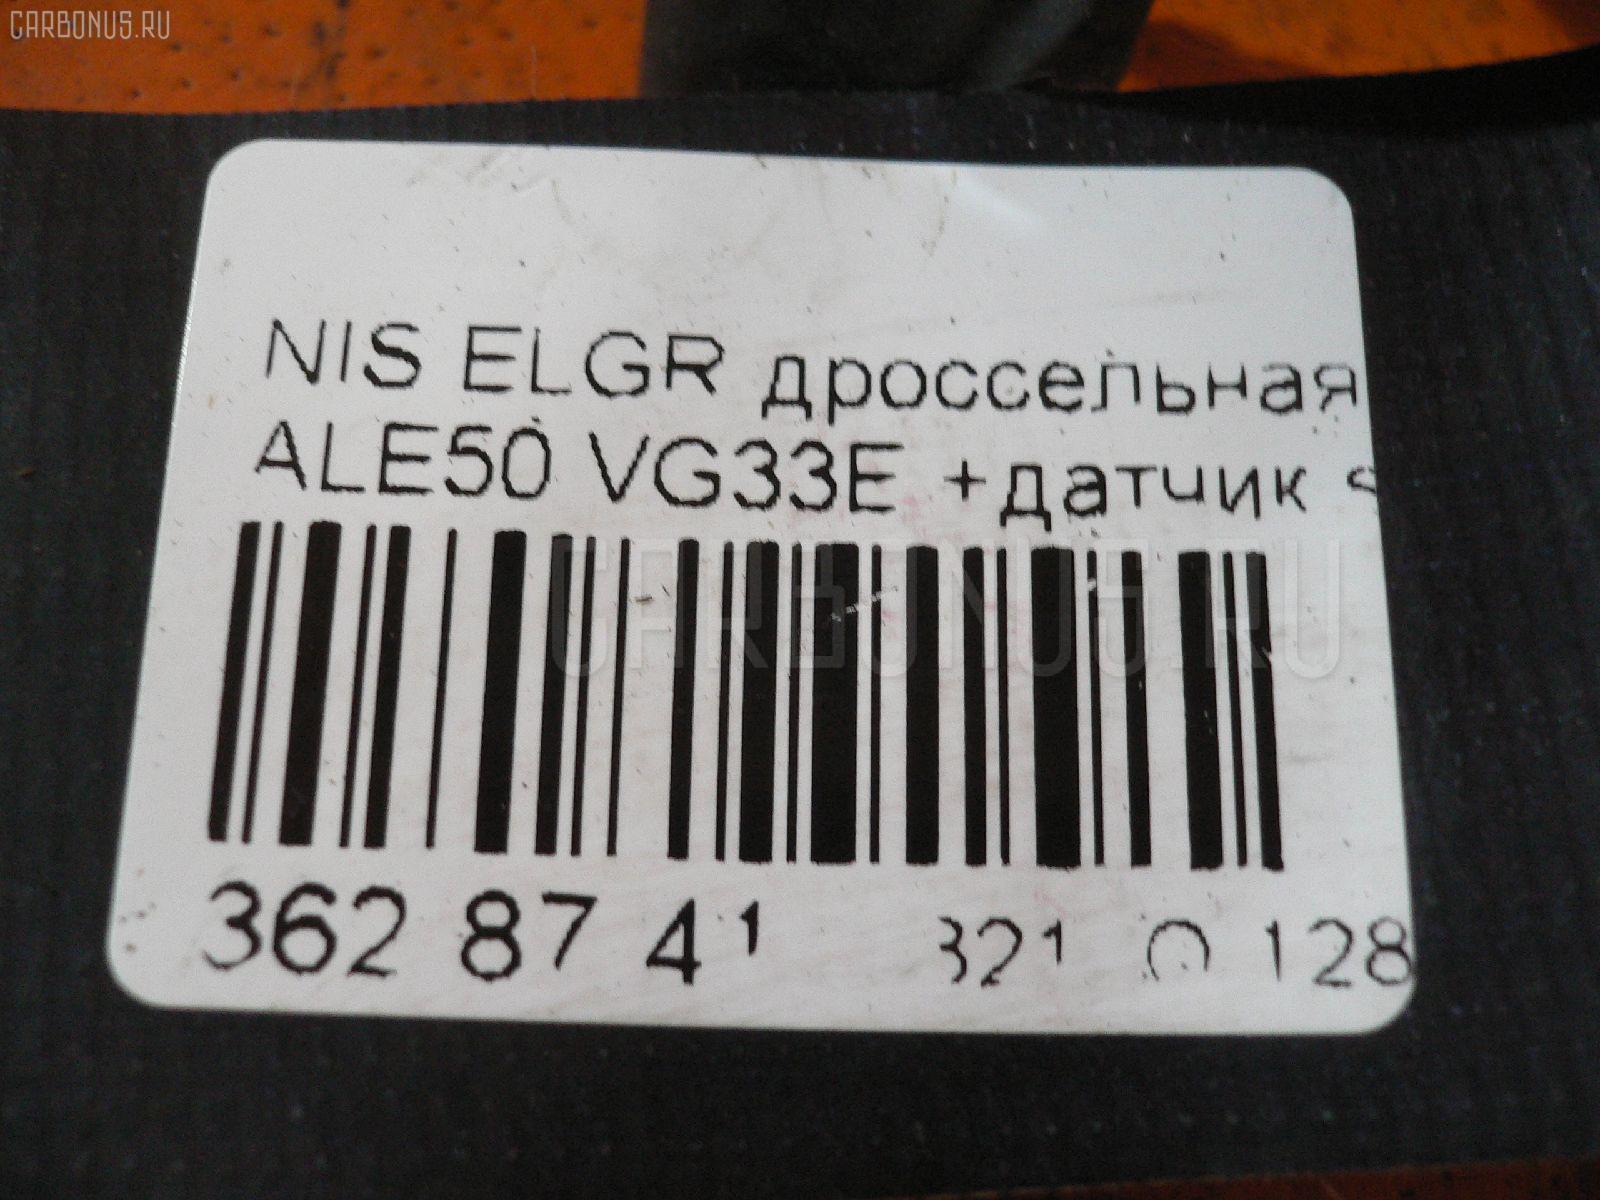 Дроссельная заслонка NISSAN ELGRAND ALE50 VG33E Фото 7